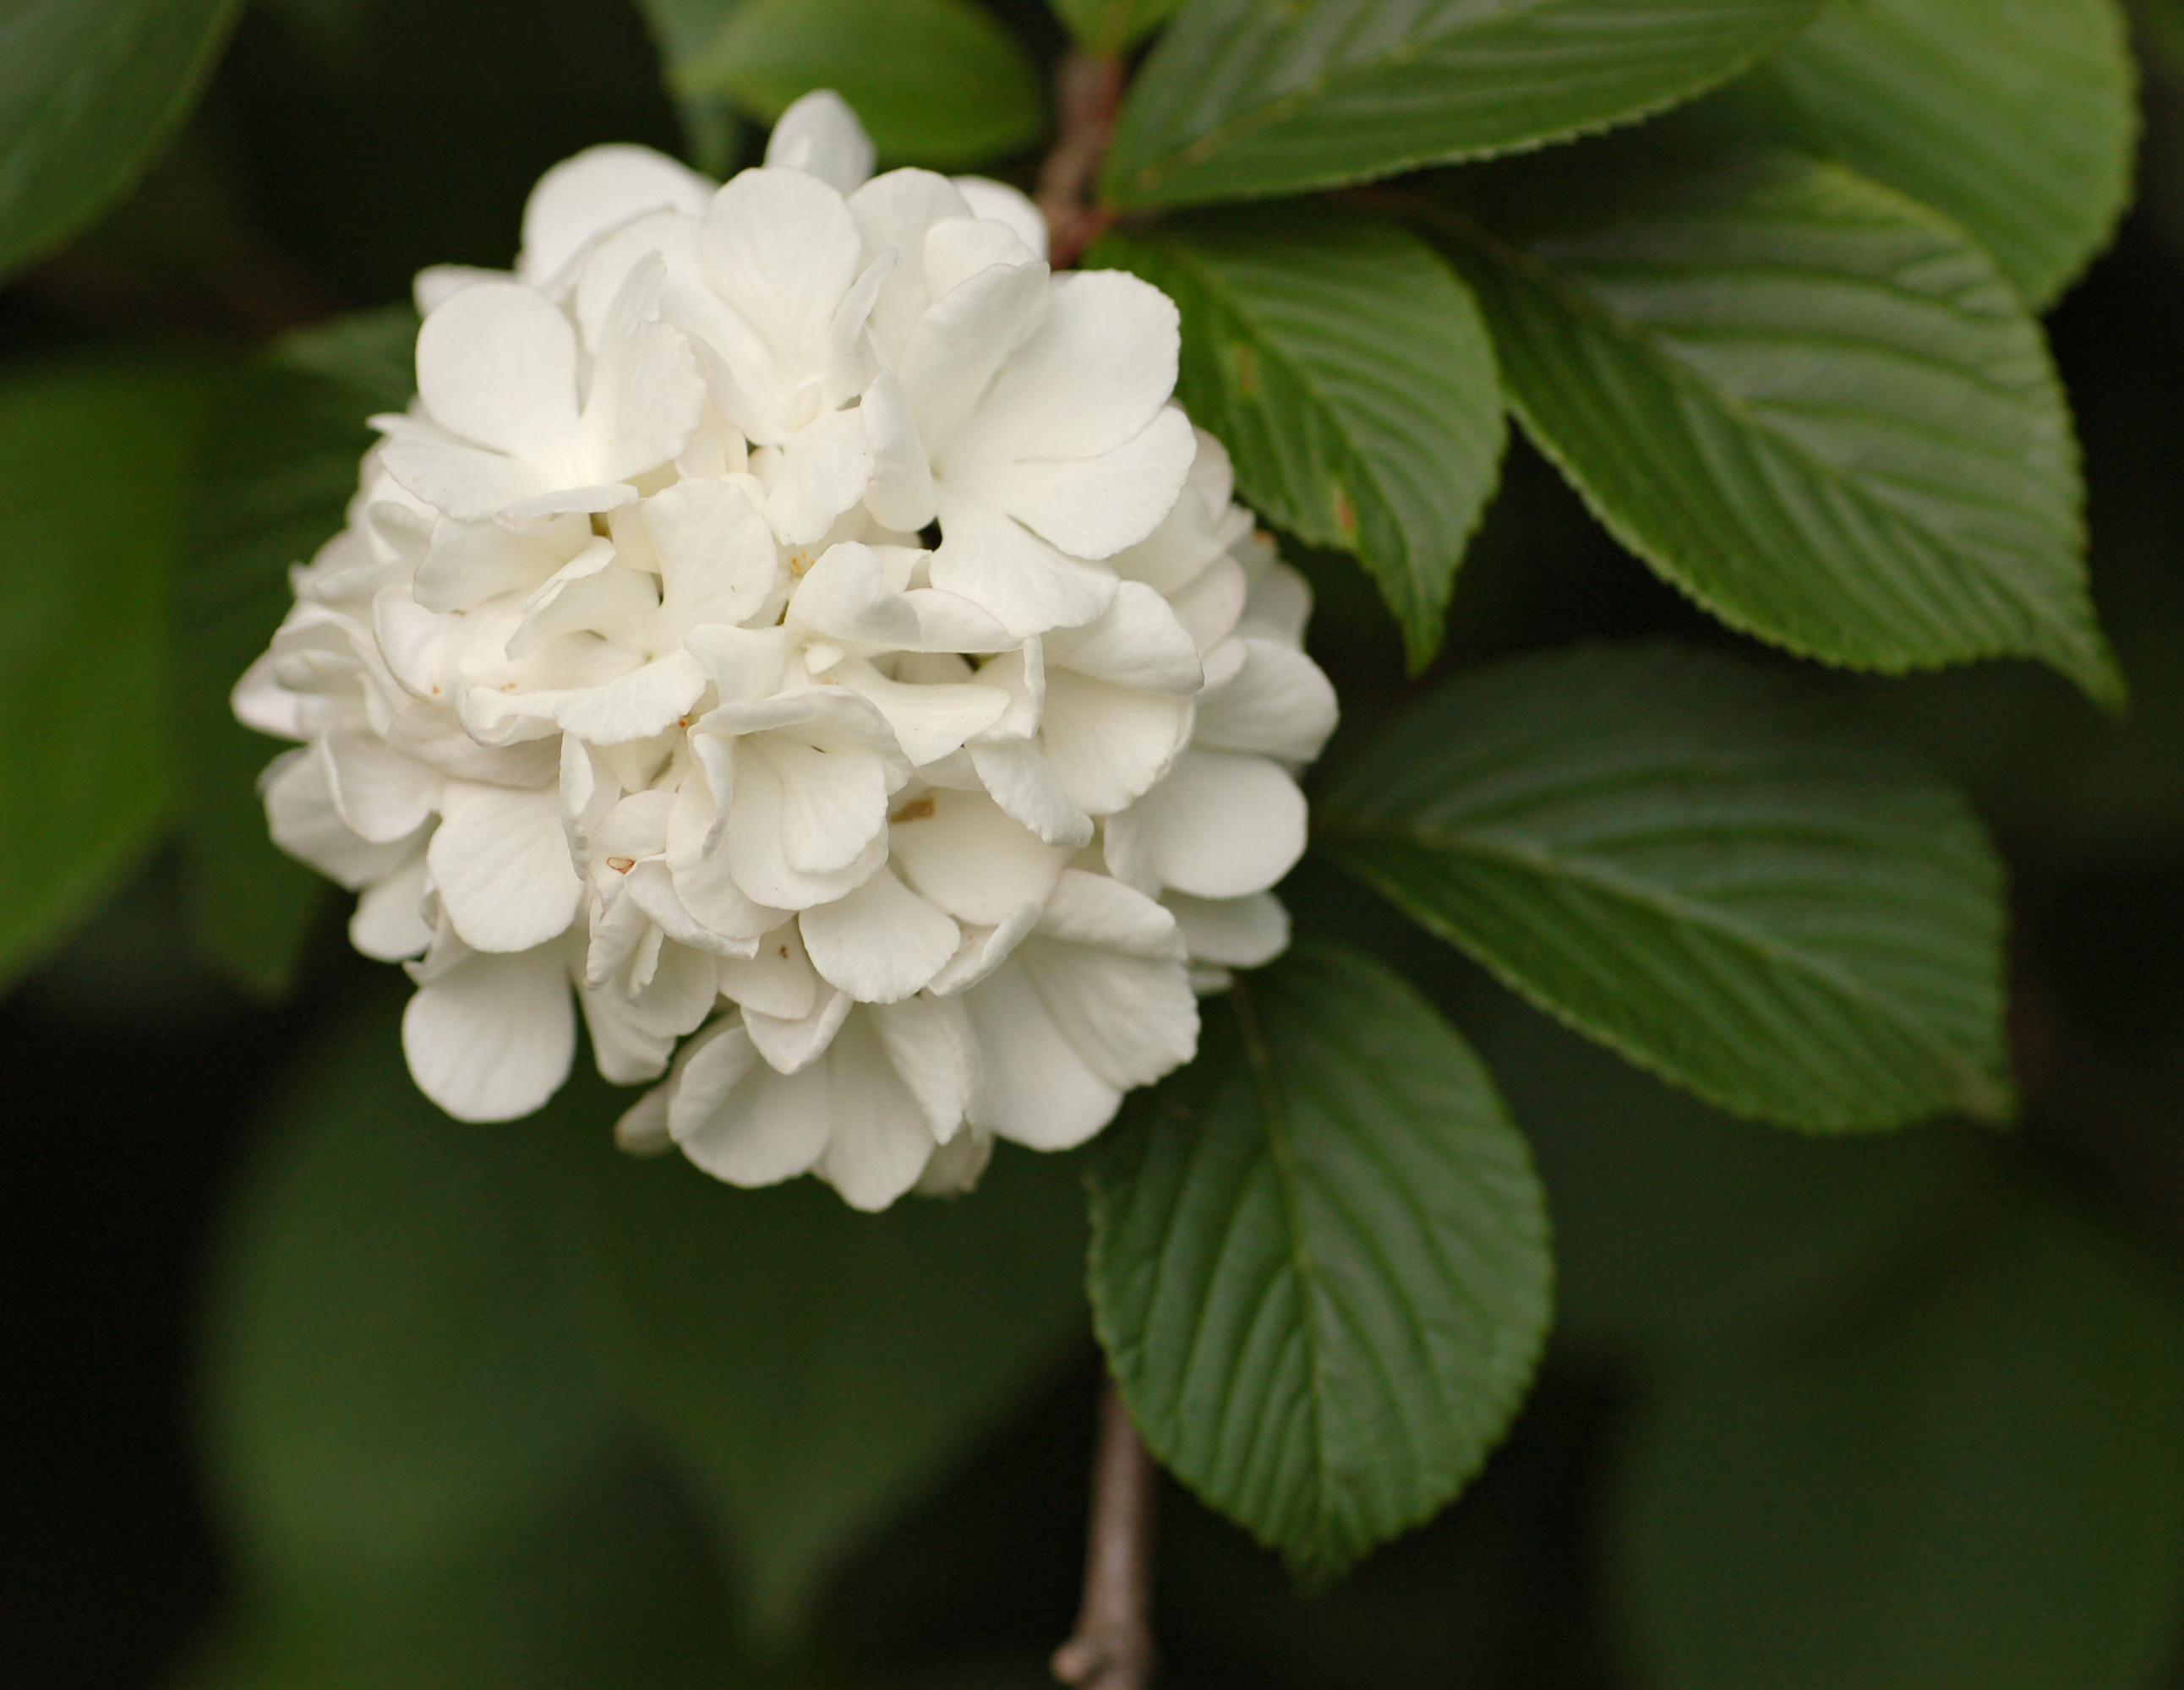 Filesnowball viburnum viburnum plicatum flower 4g wikimedia filesnowball viburnum viburnum plicatum flower 4g mightylinksfo